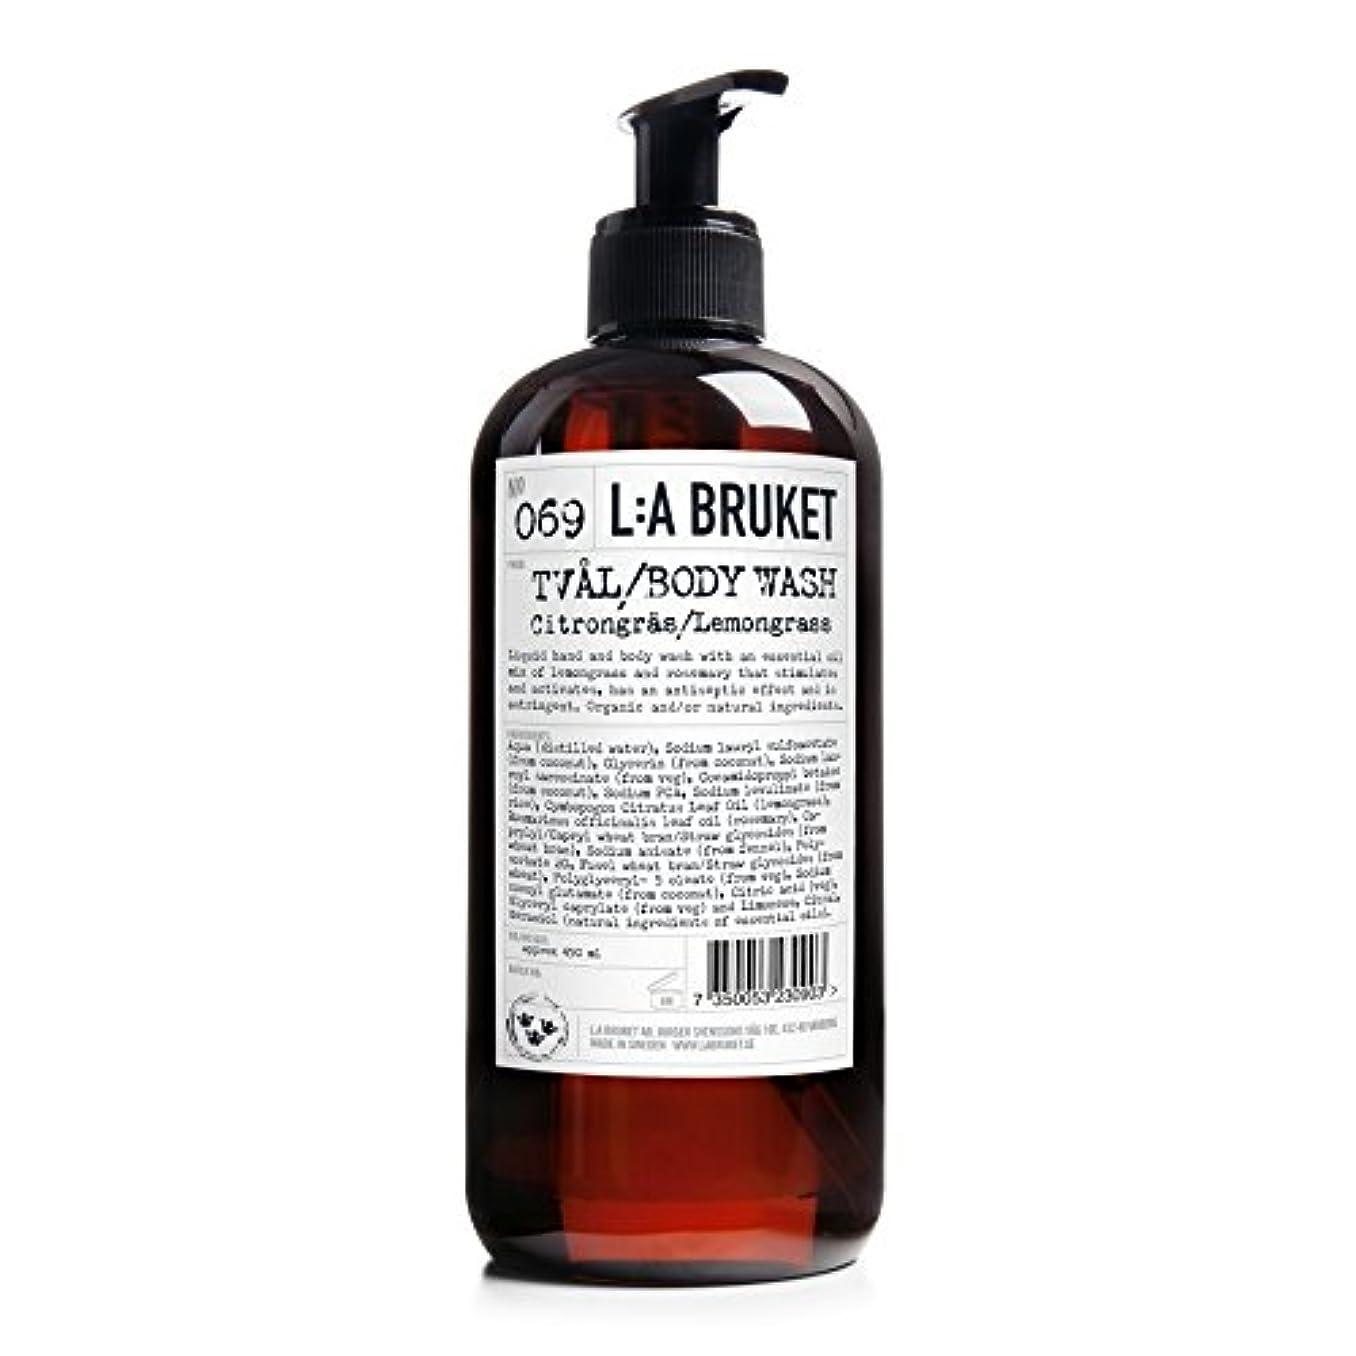 L:A Bruket Lemongrass Liquid Soap 450ml - :レモングラス液体石鹸450ミリリットル [並行輸入品]